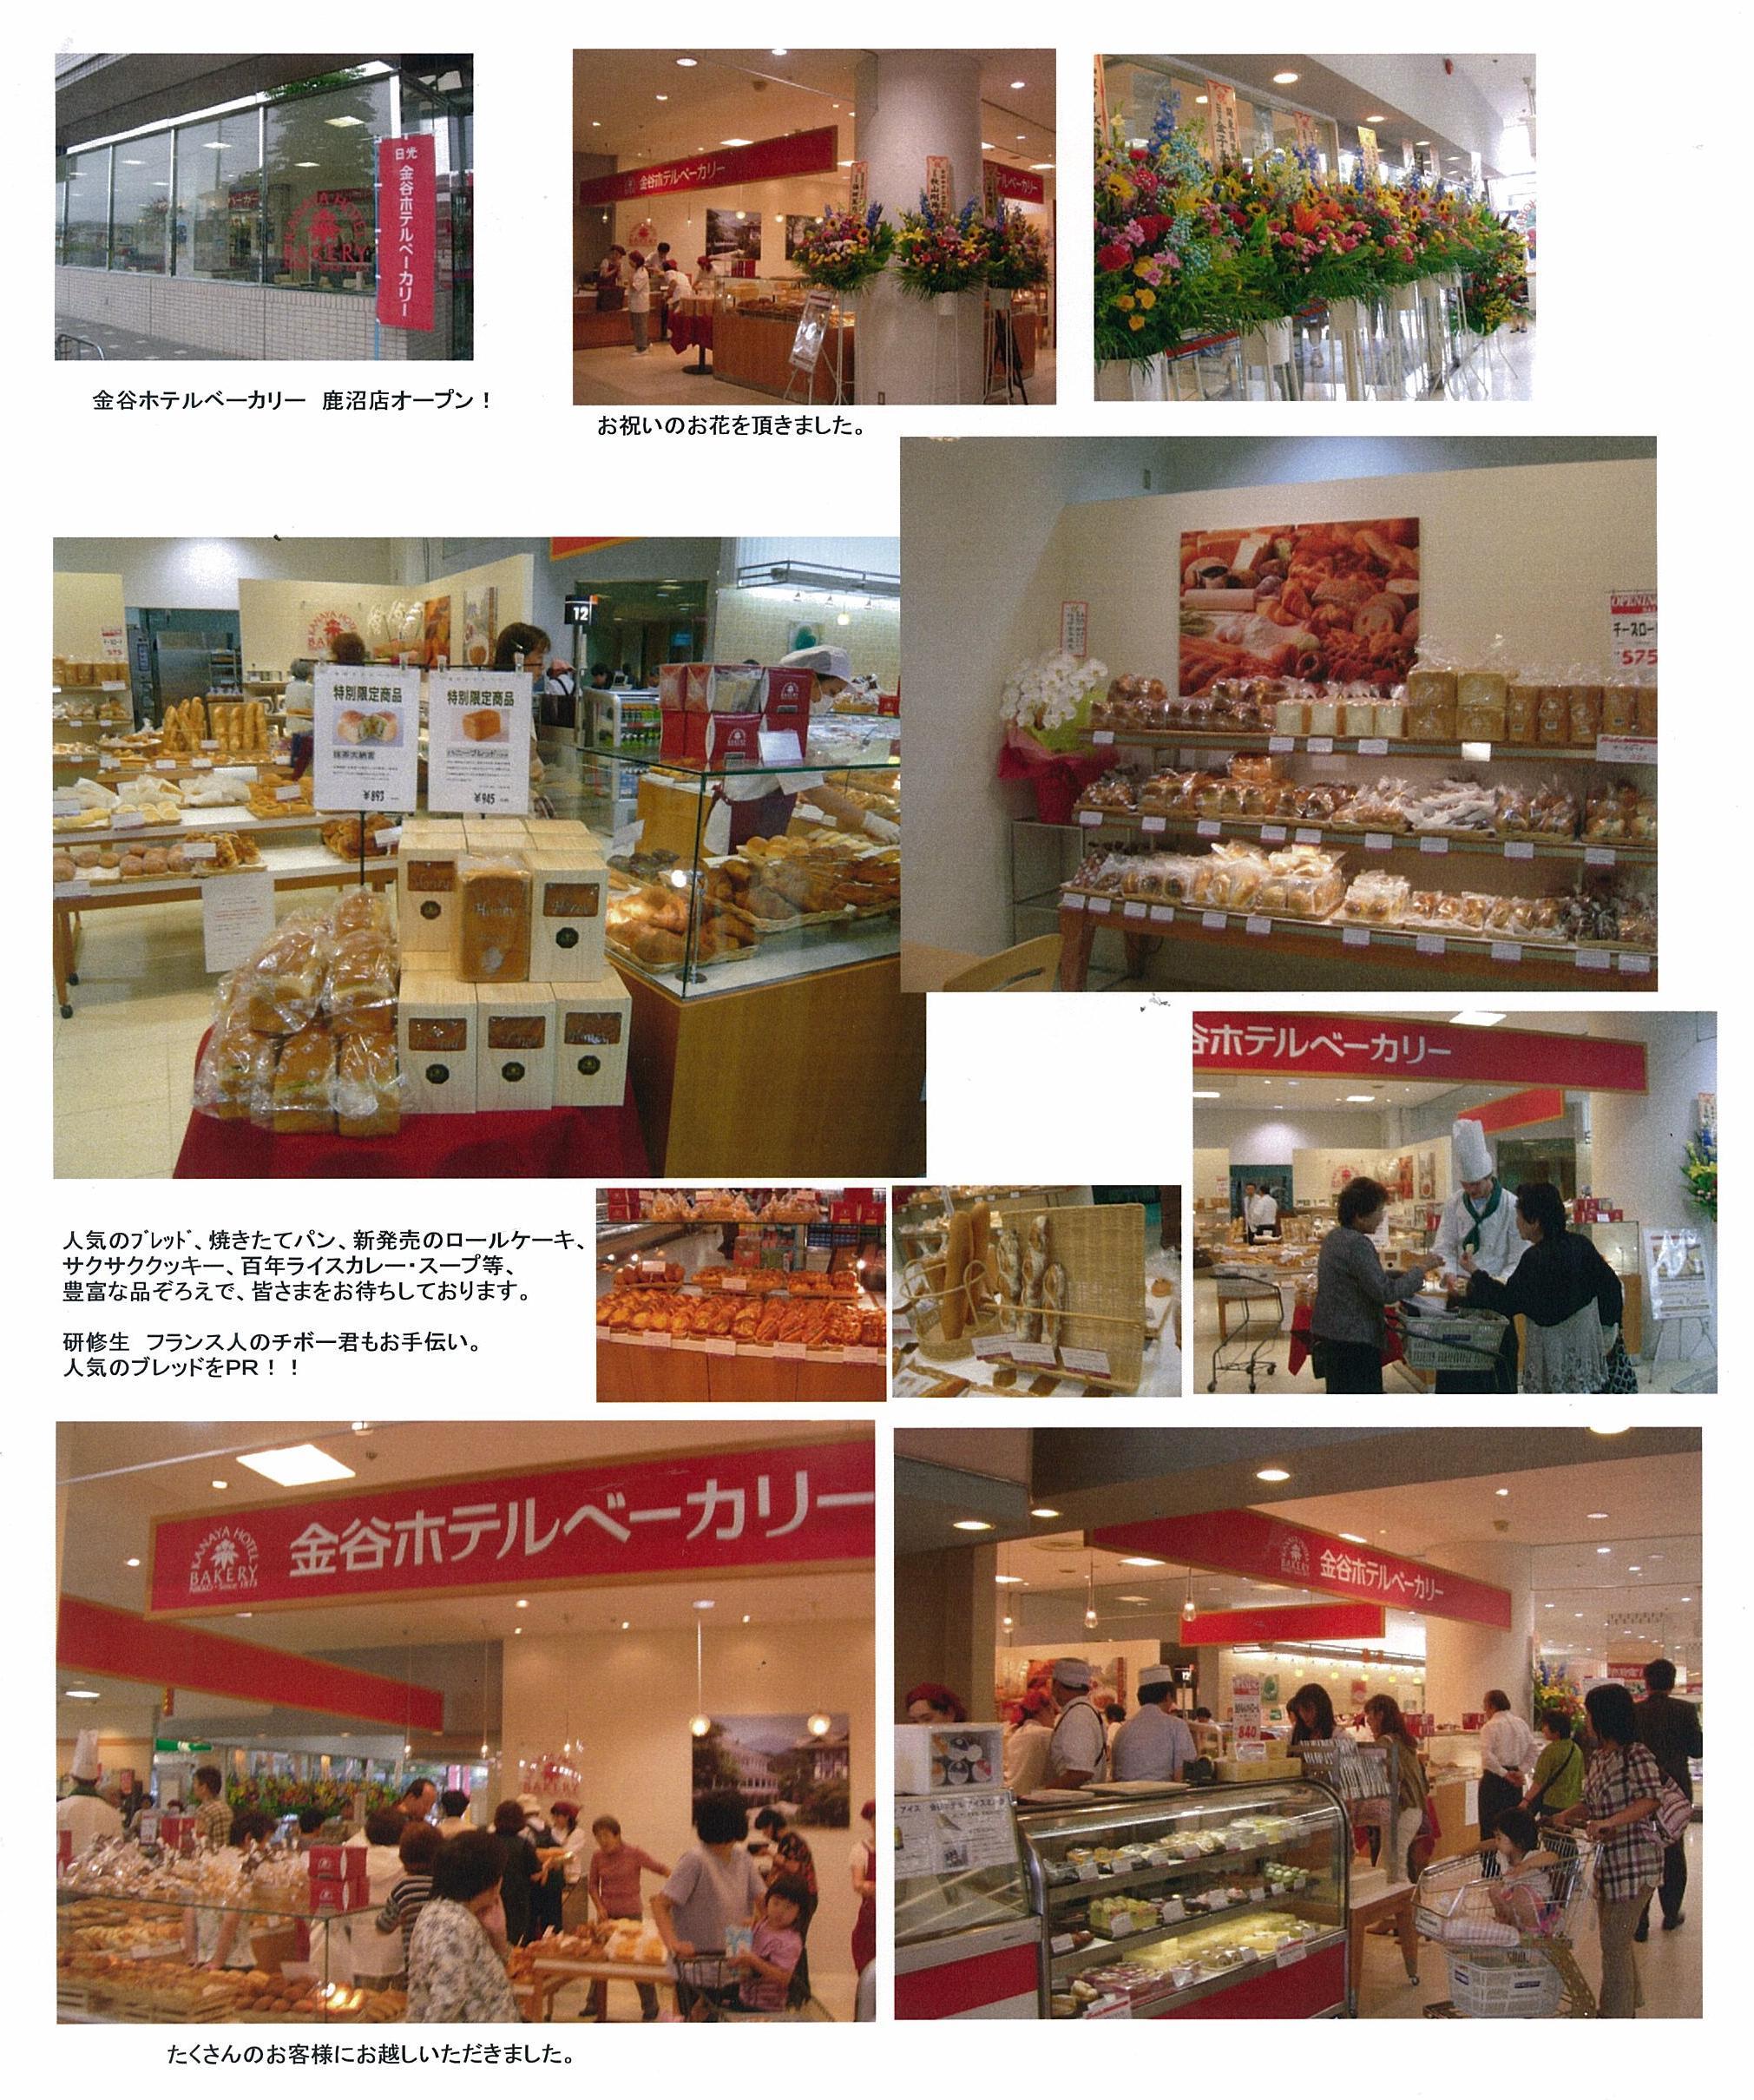 http://kanayahotelbaker.sakura.ne.jp/img-715103341-0001.jpg